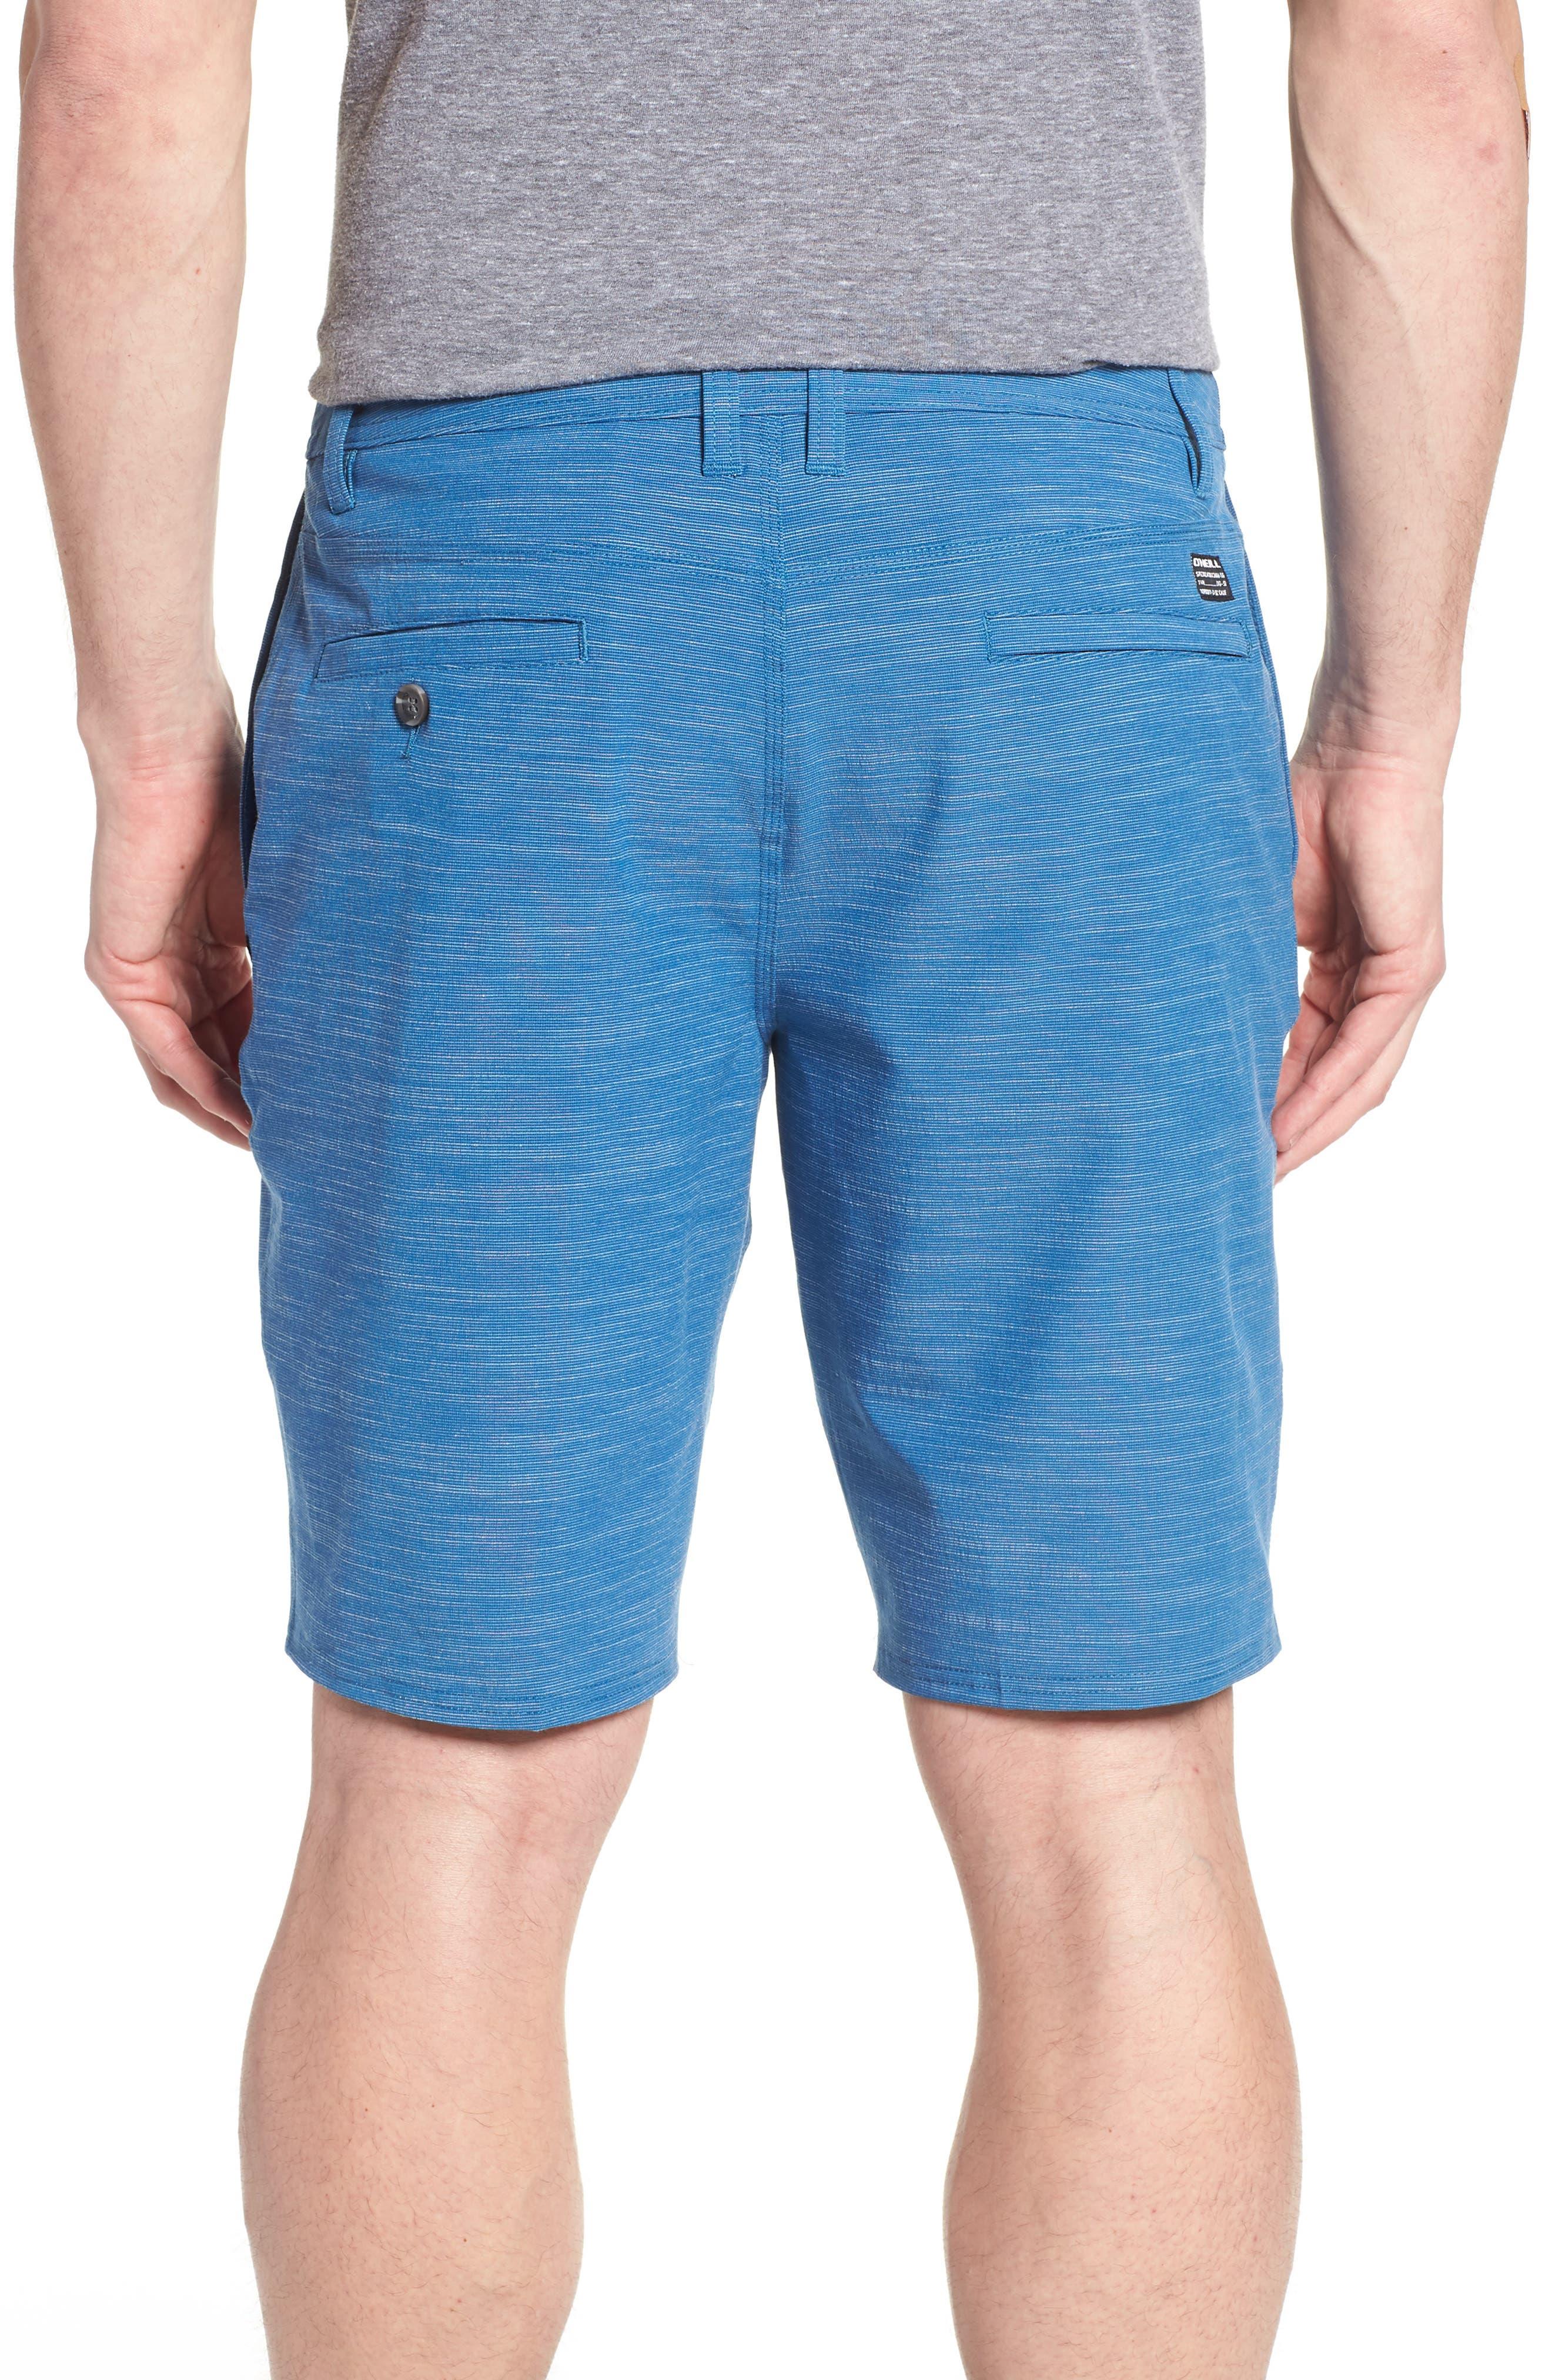 Locked Slub Hybrid Shorts,                             Alternate thumbnail 2, color,                             Air Force Blue